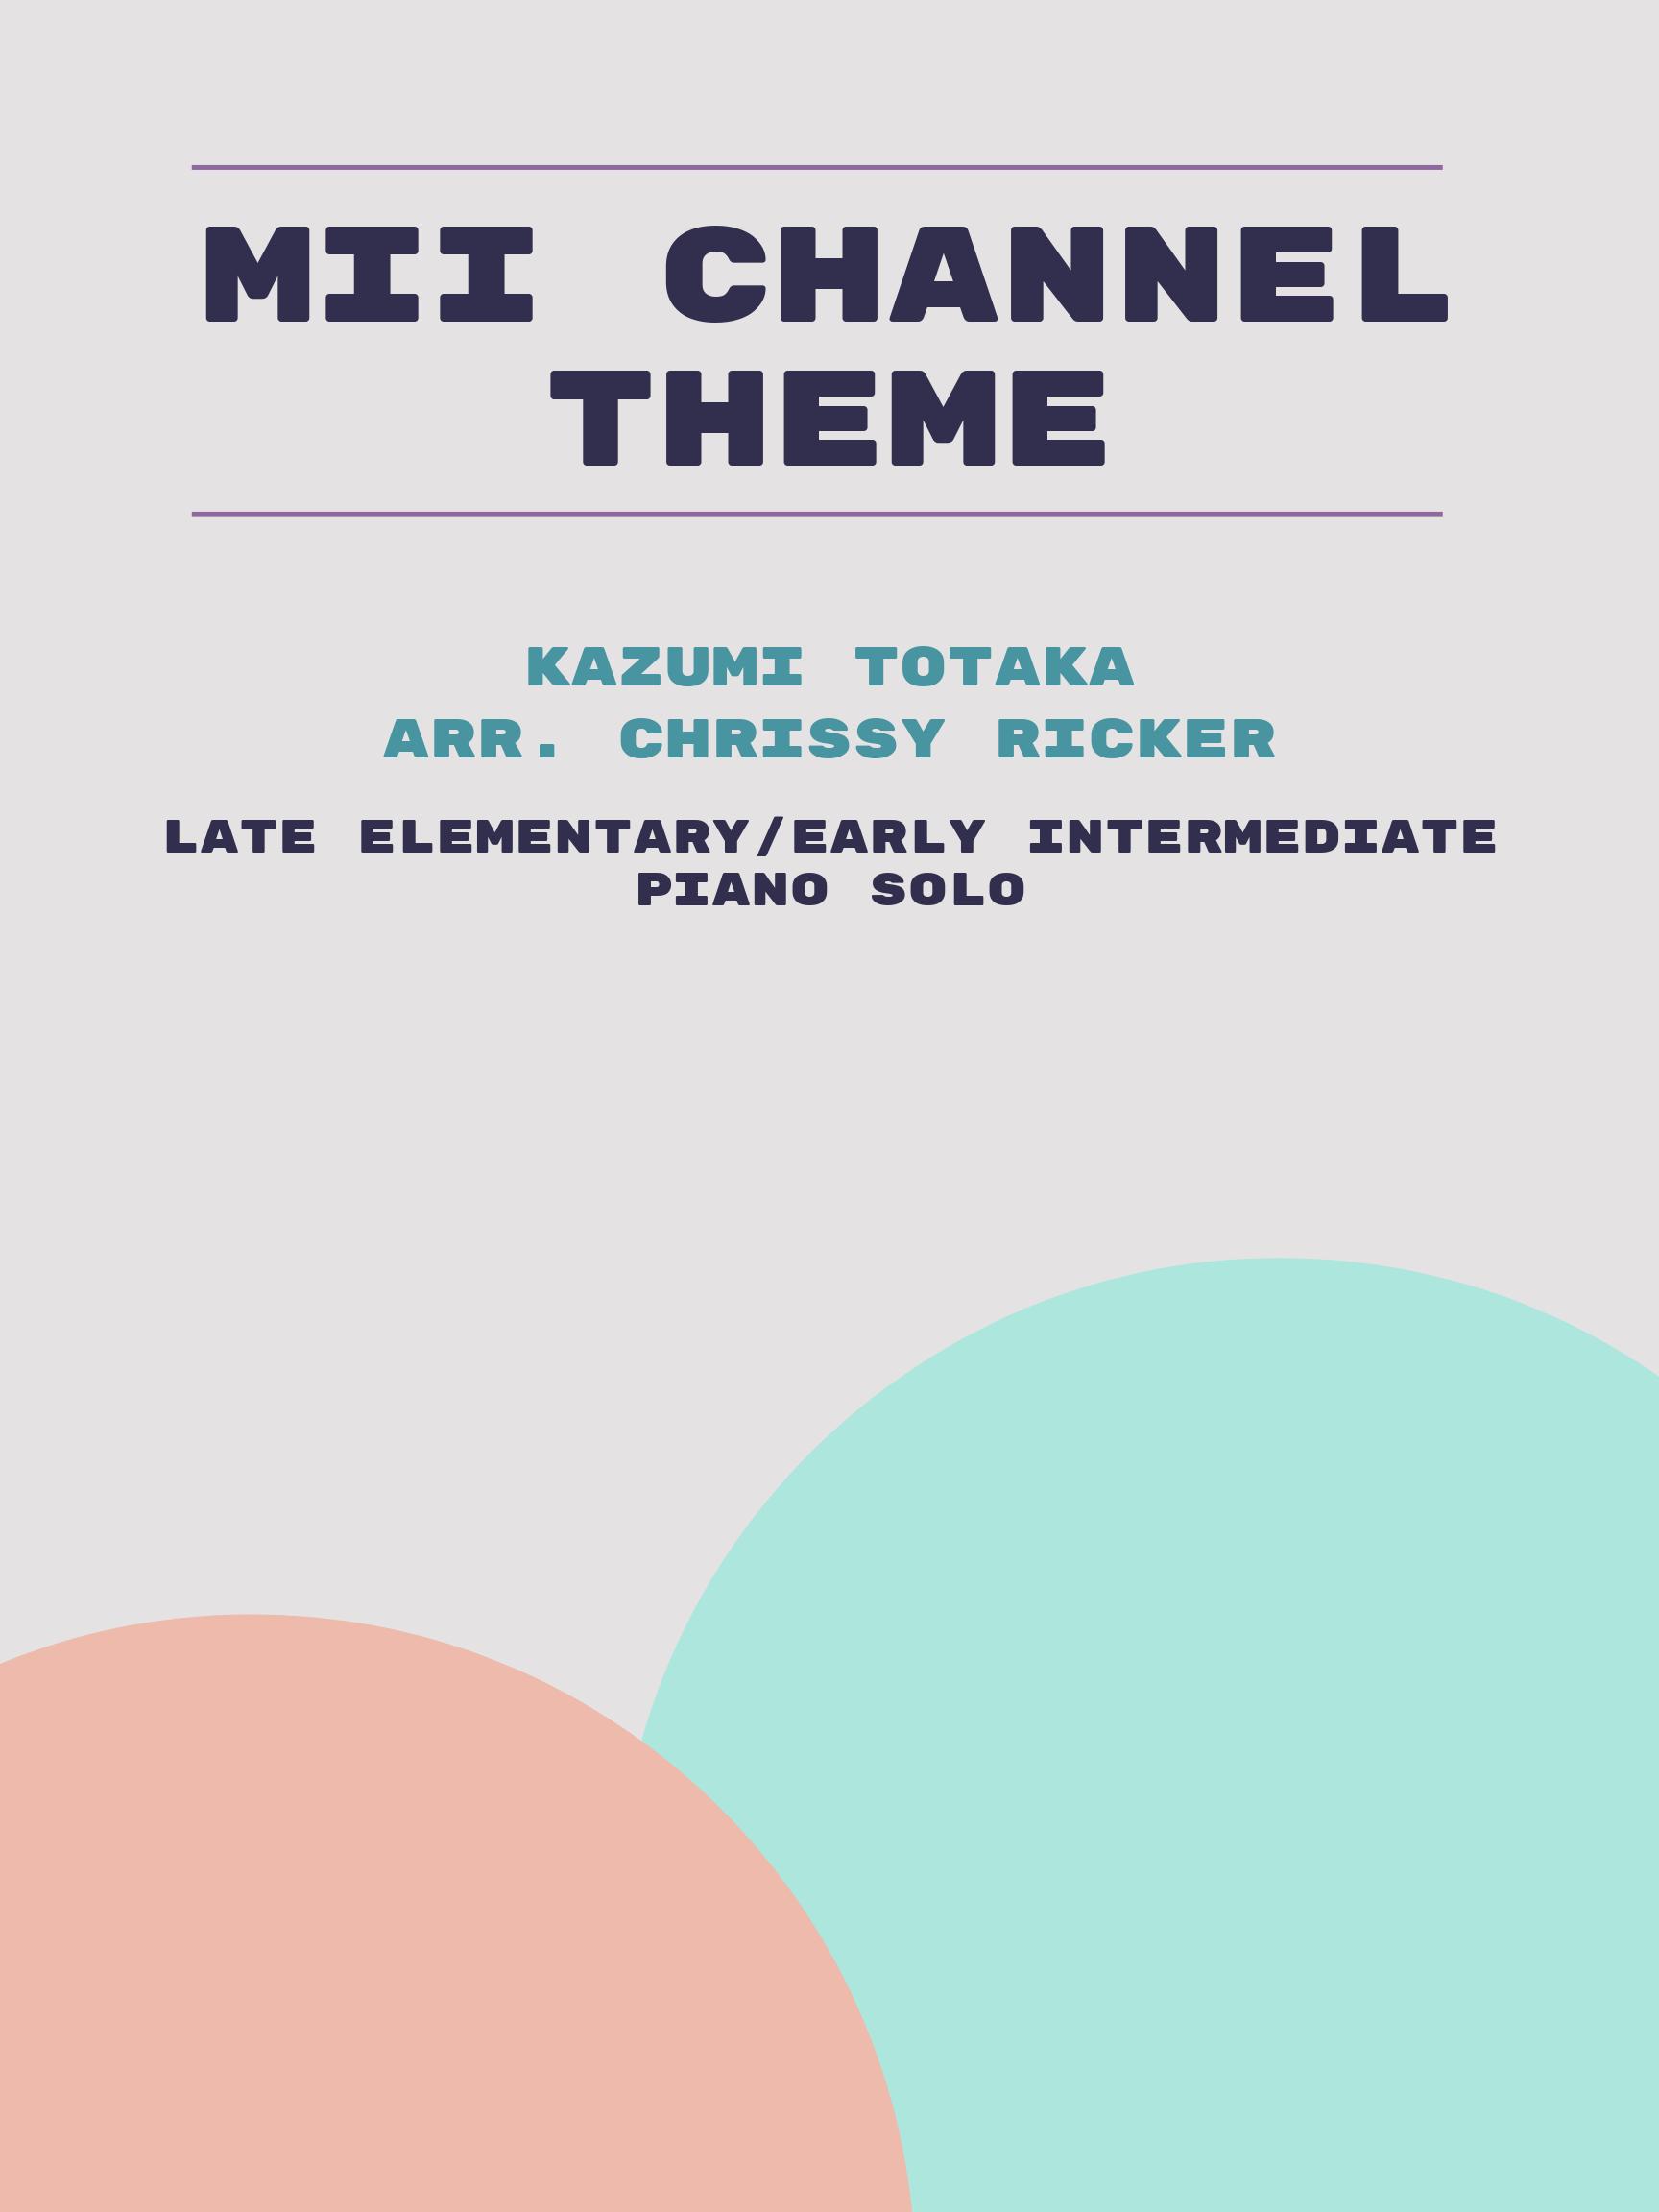 Mii Channel Theme by Kazumi Totaka